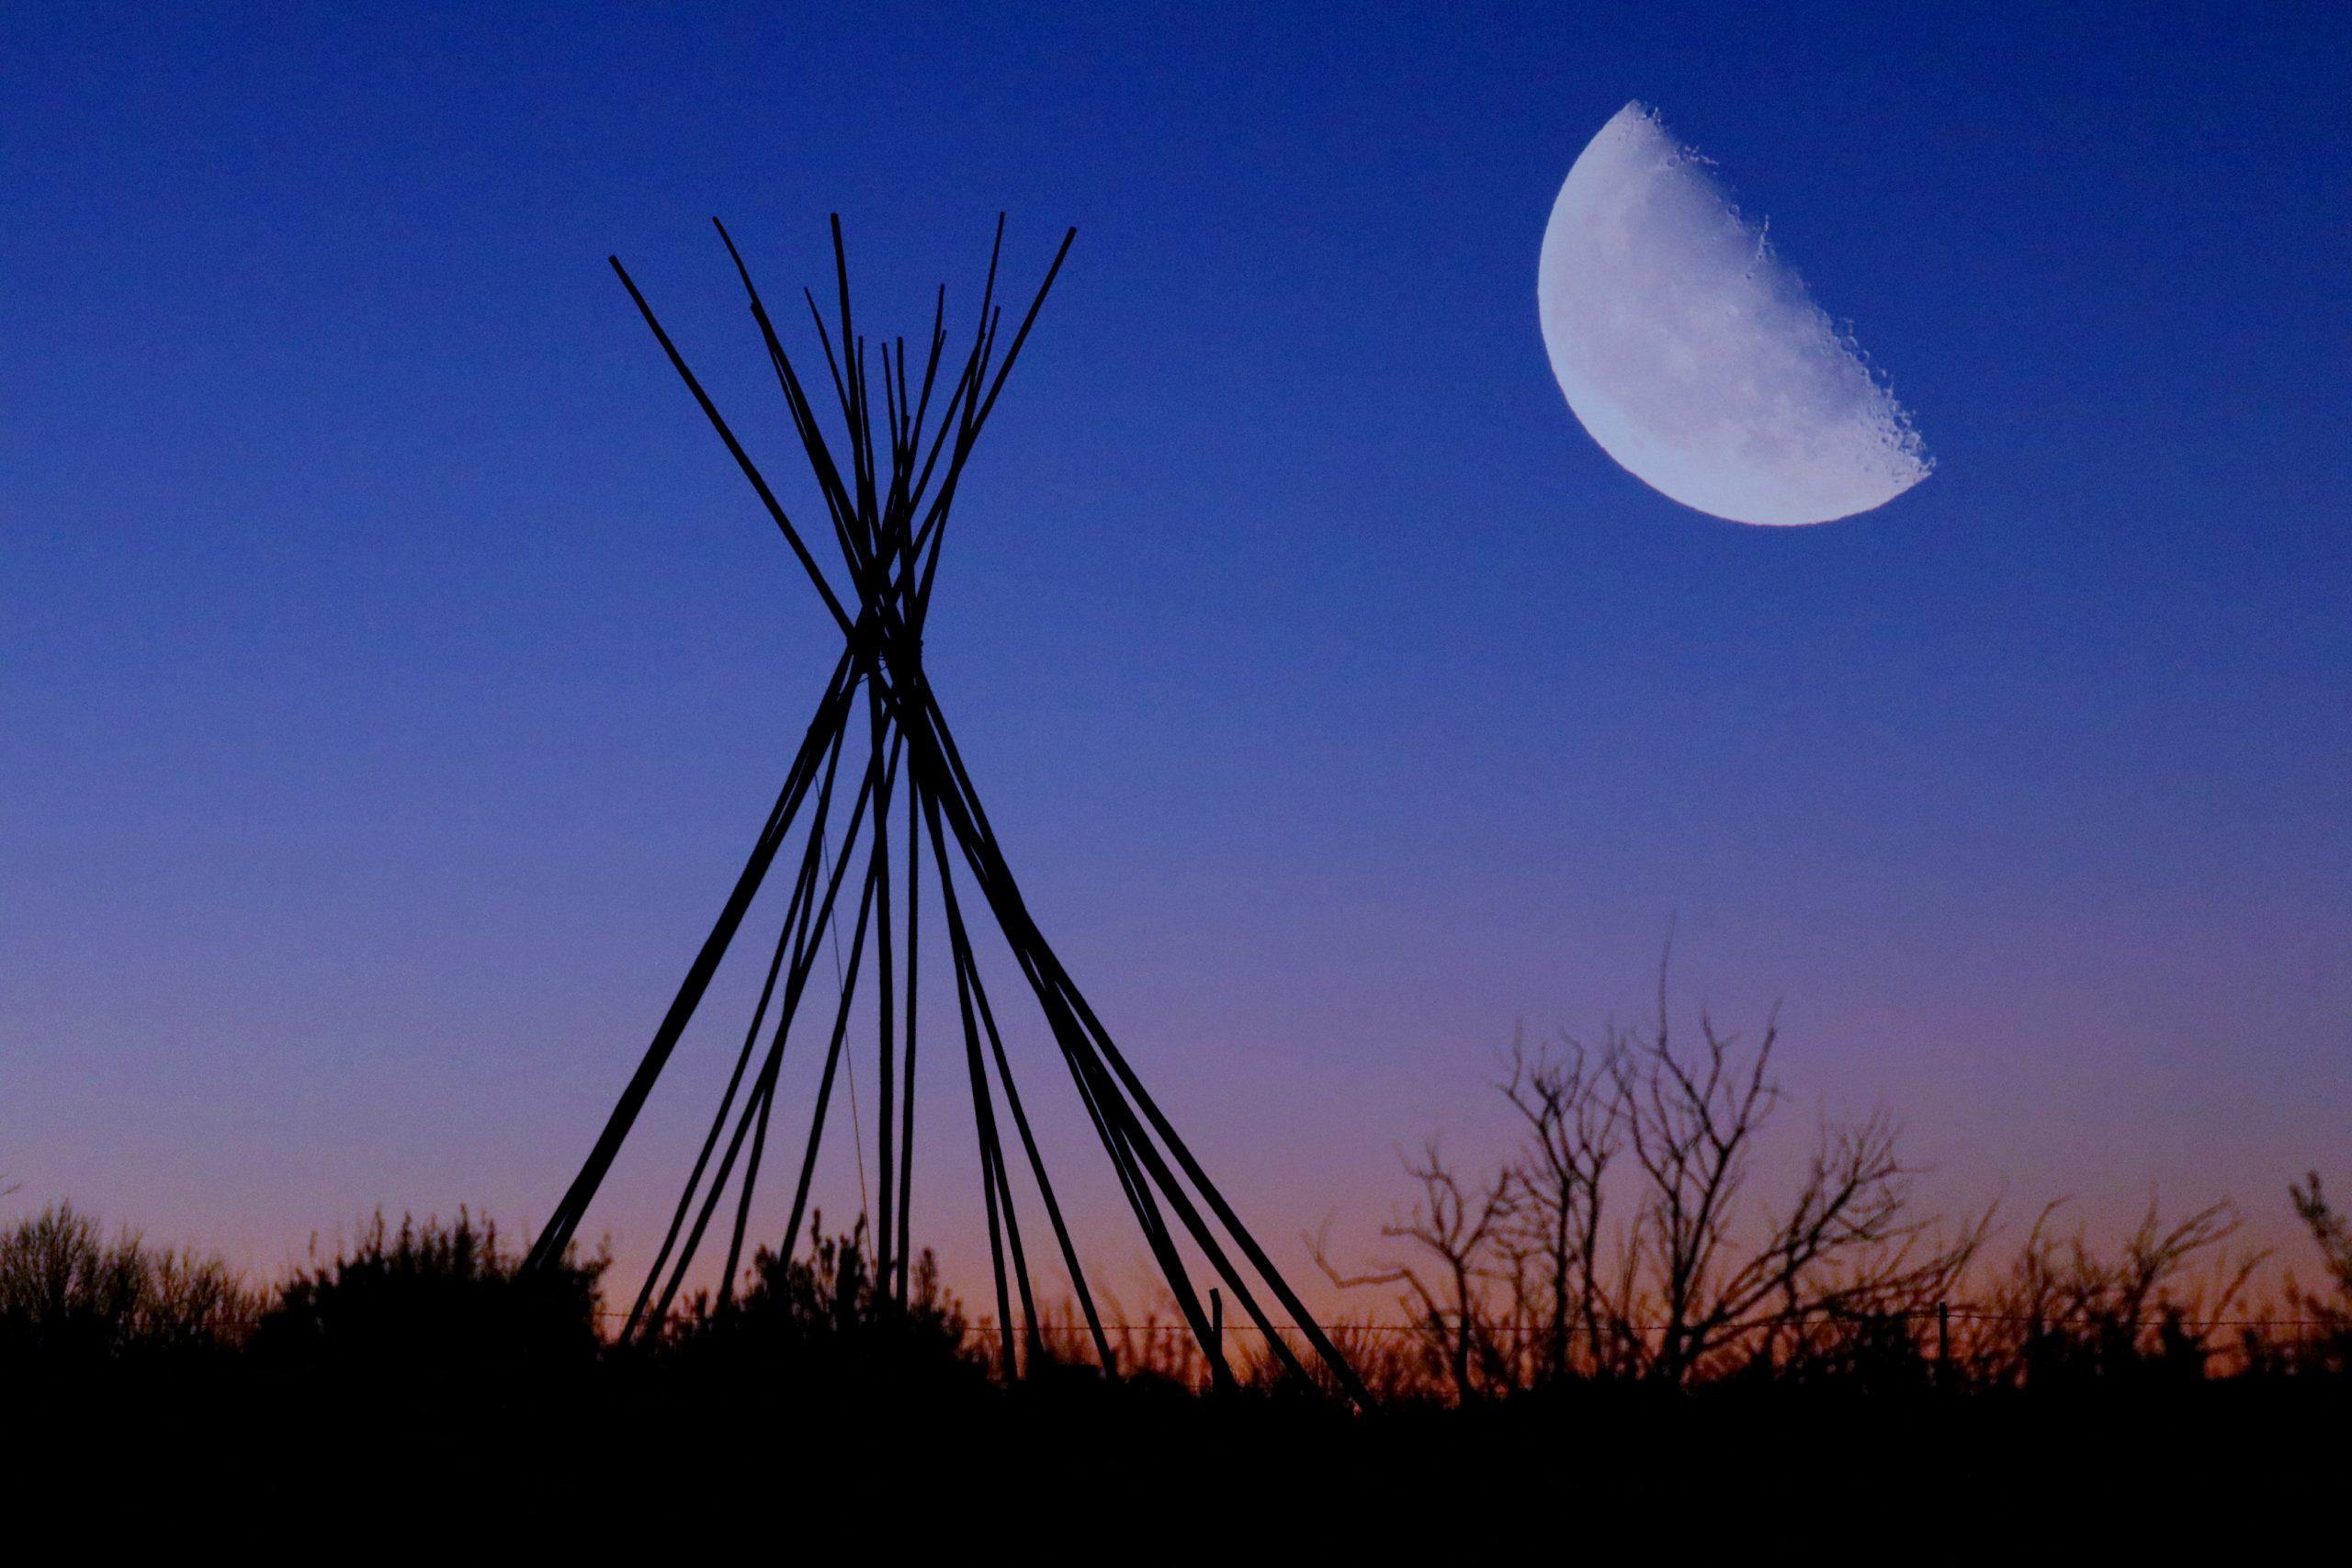 teepee-rising-moon-452J6PF